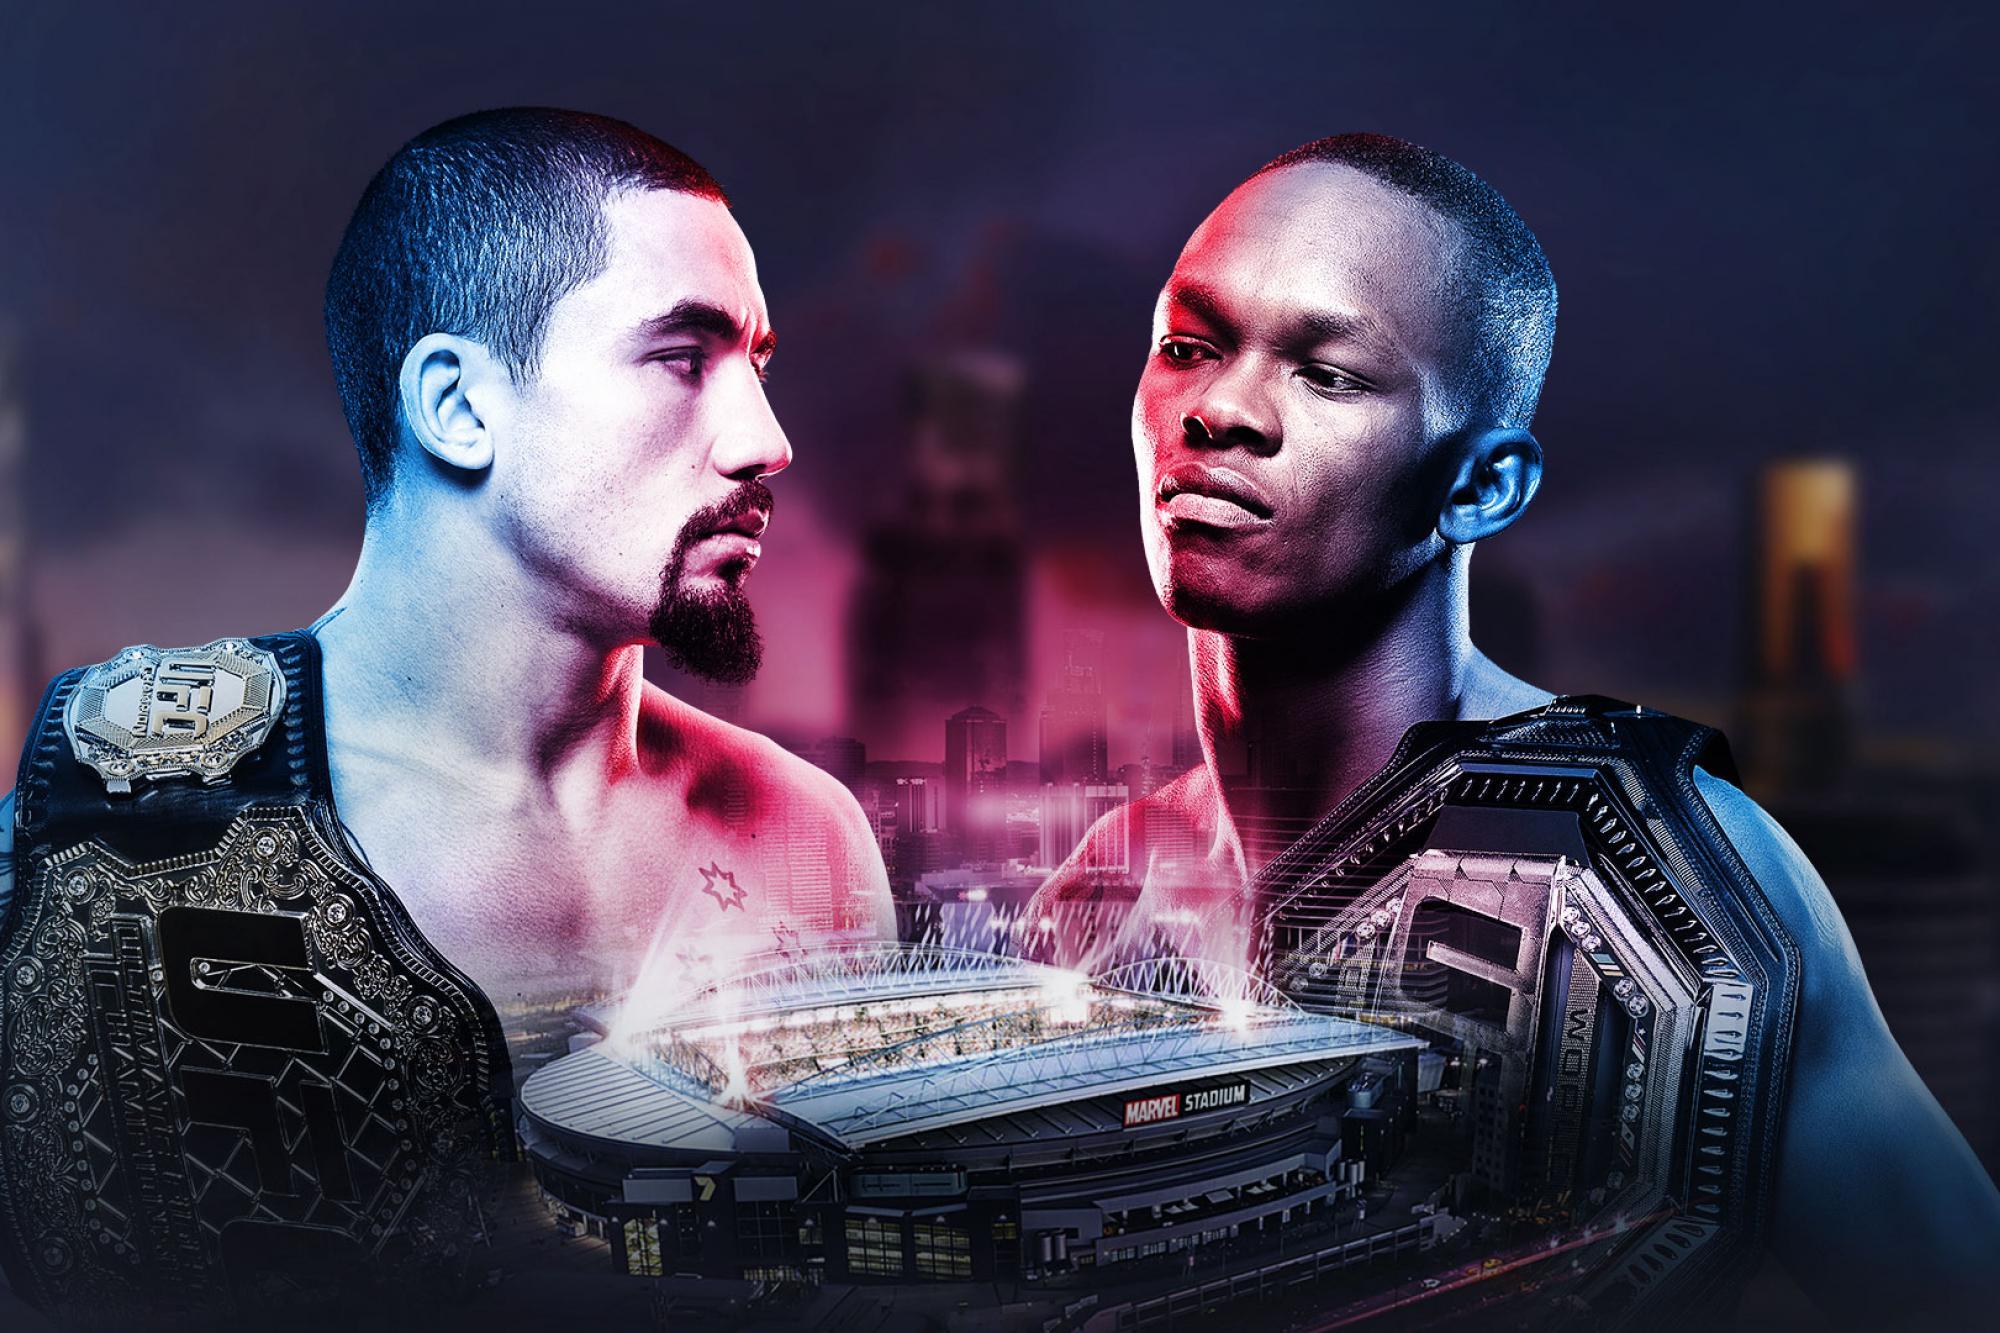 X198 UFC 243 Whittaker VS Adesanya MMA Fight New Event Fabric Poster 24x36 27x40